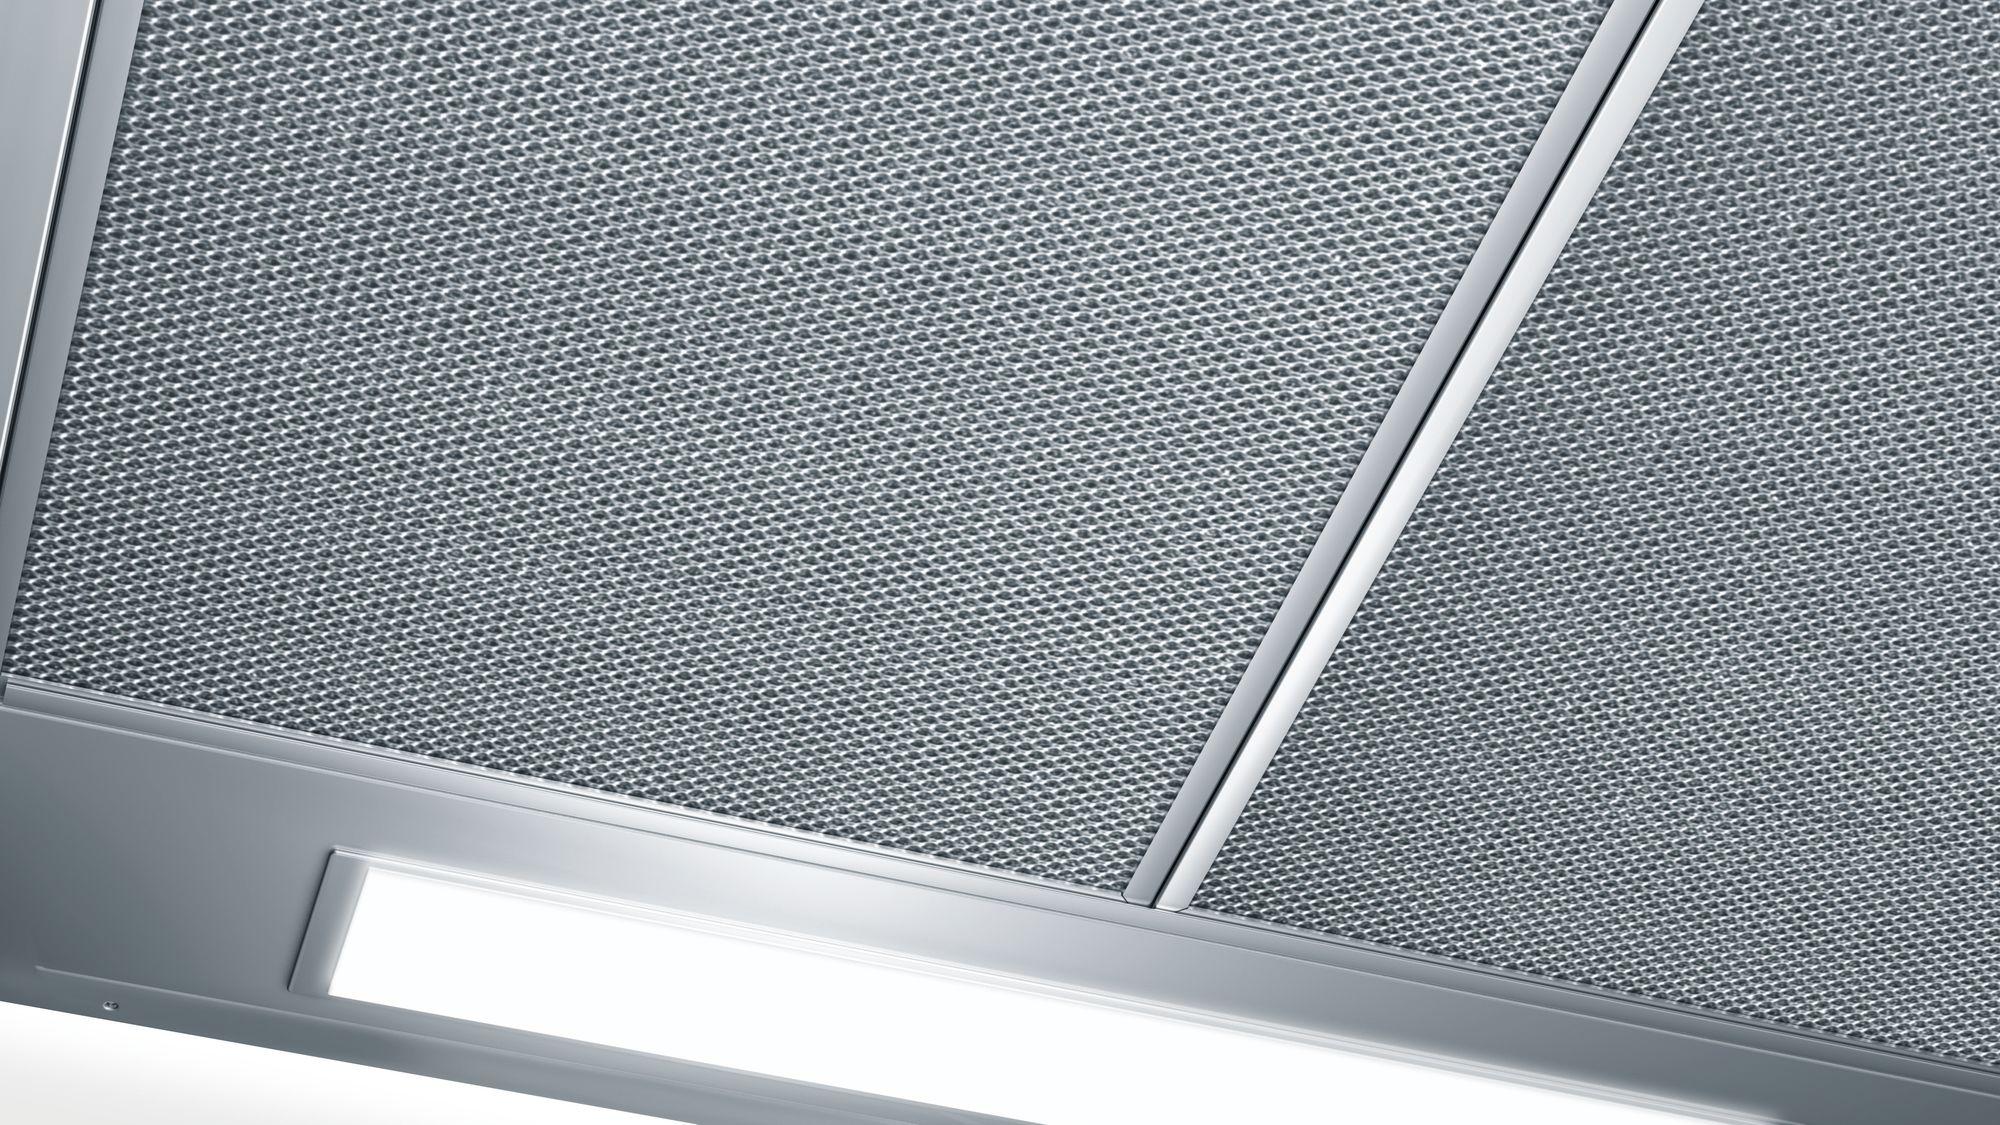 Bosch dul63cc50 edelstahl abzugshaube 60cm unterbau dunstabzugshaube